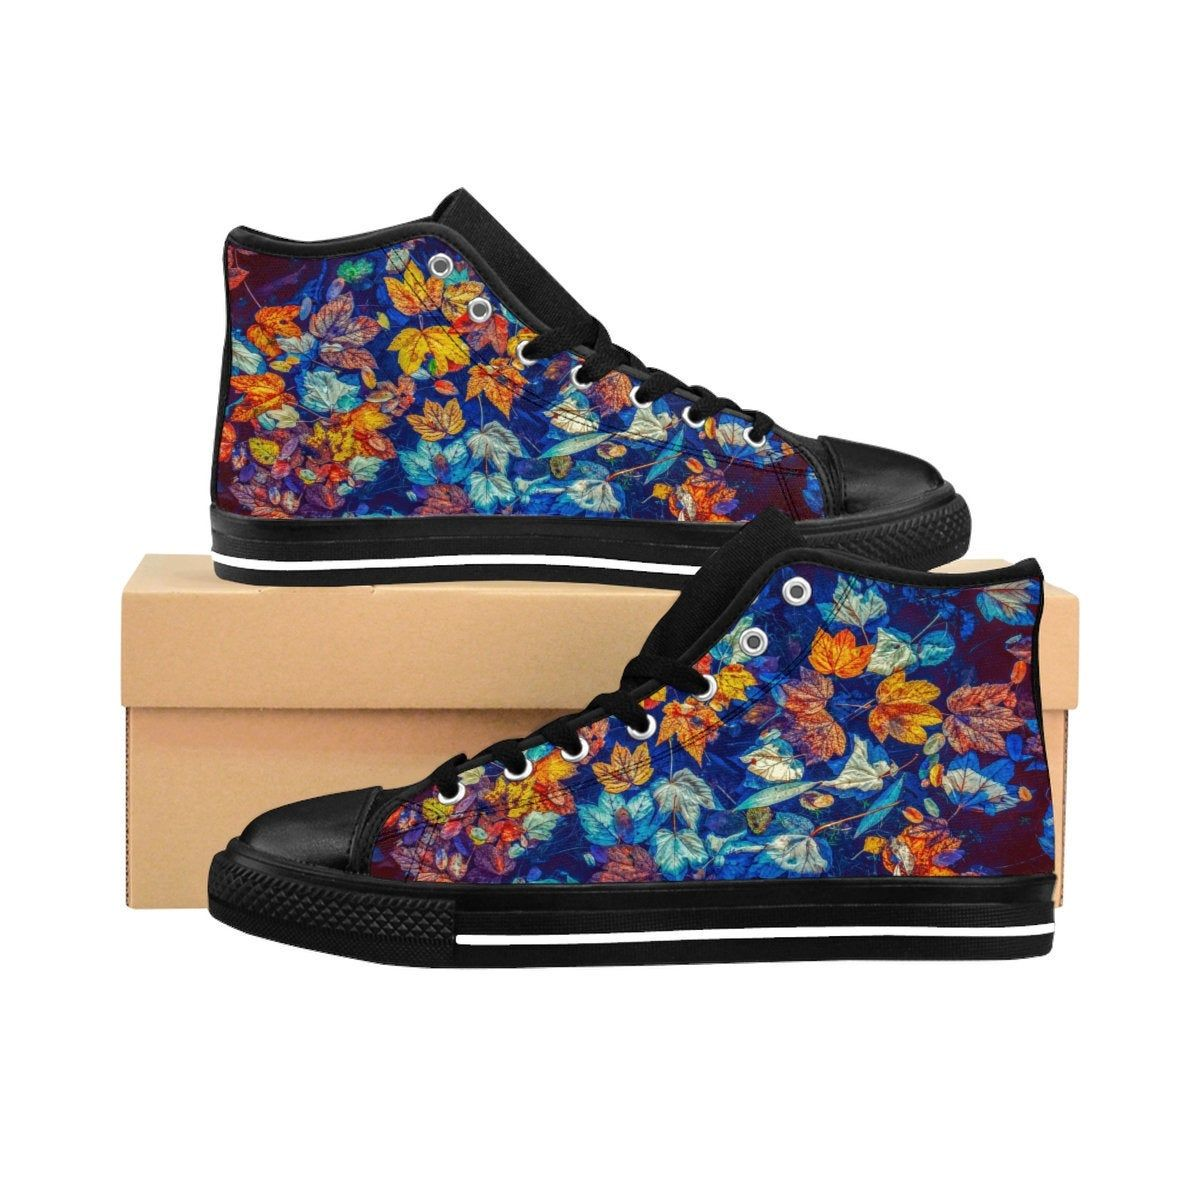 Fall Leaves High top Shoes | Autumn Hi Tops Kicks ...